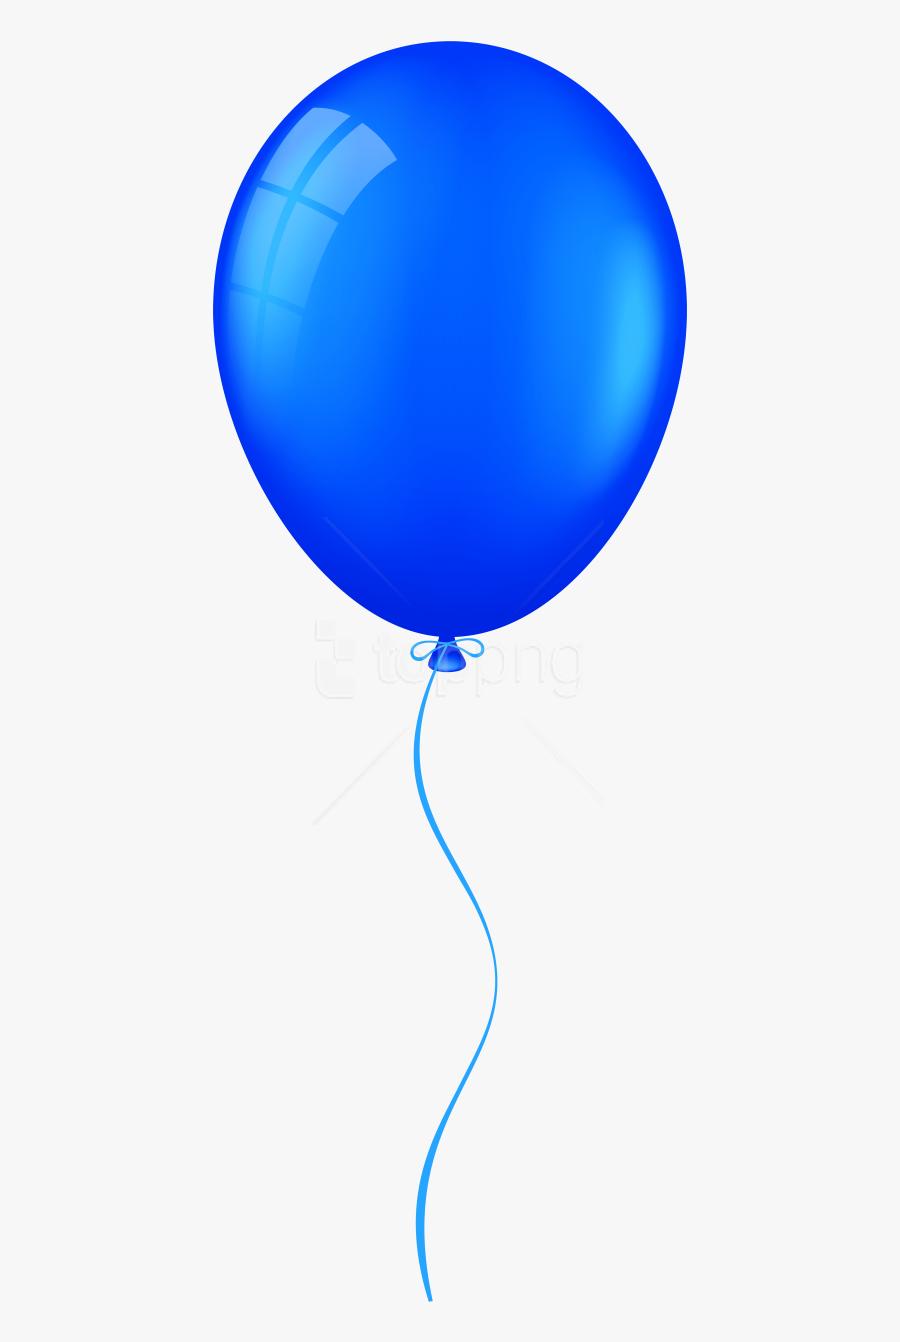 Blue Balloon Png - Balloon Clipart Transparent Background, Transparent Clipart